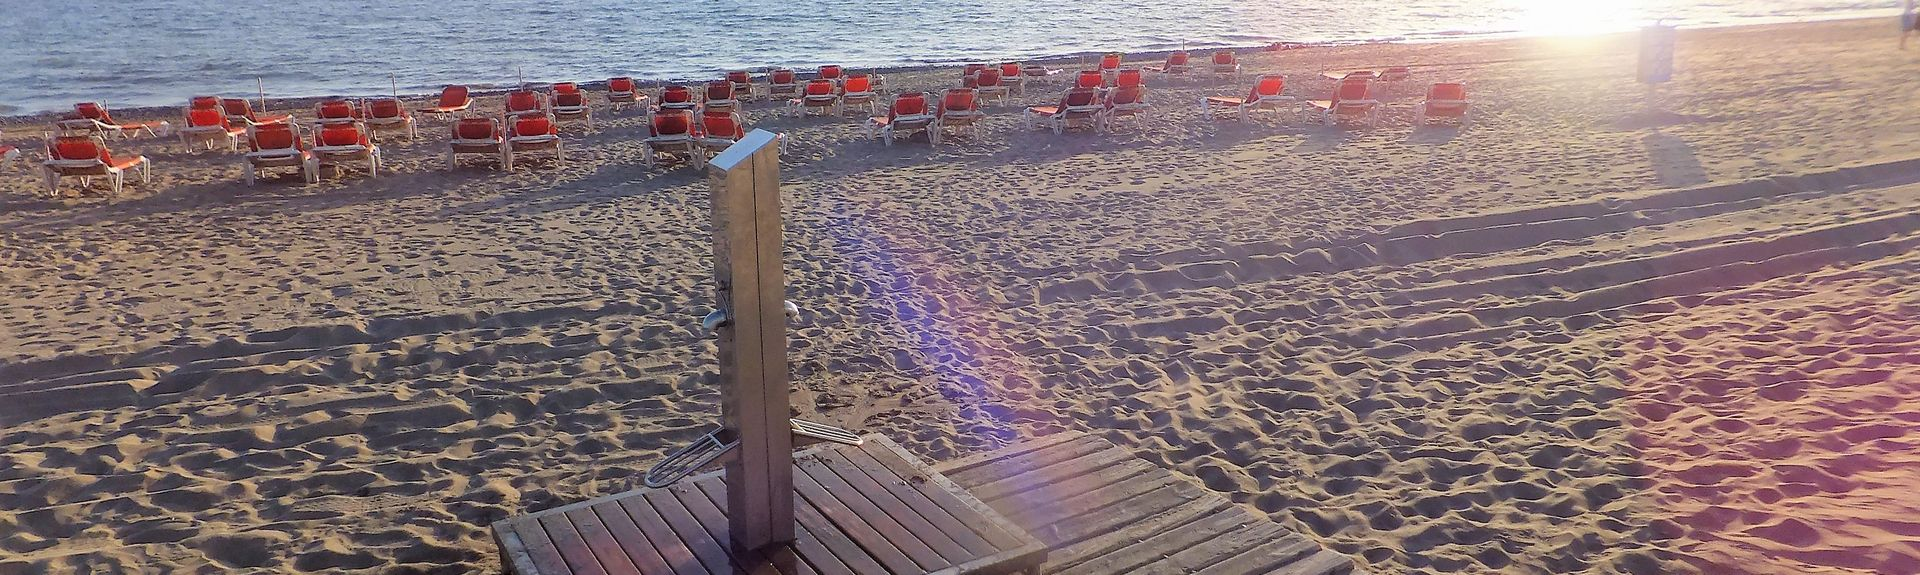 Sonnenland, Maspalomas, De Kanariske Øer, Spanien